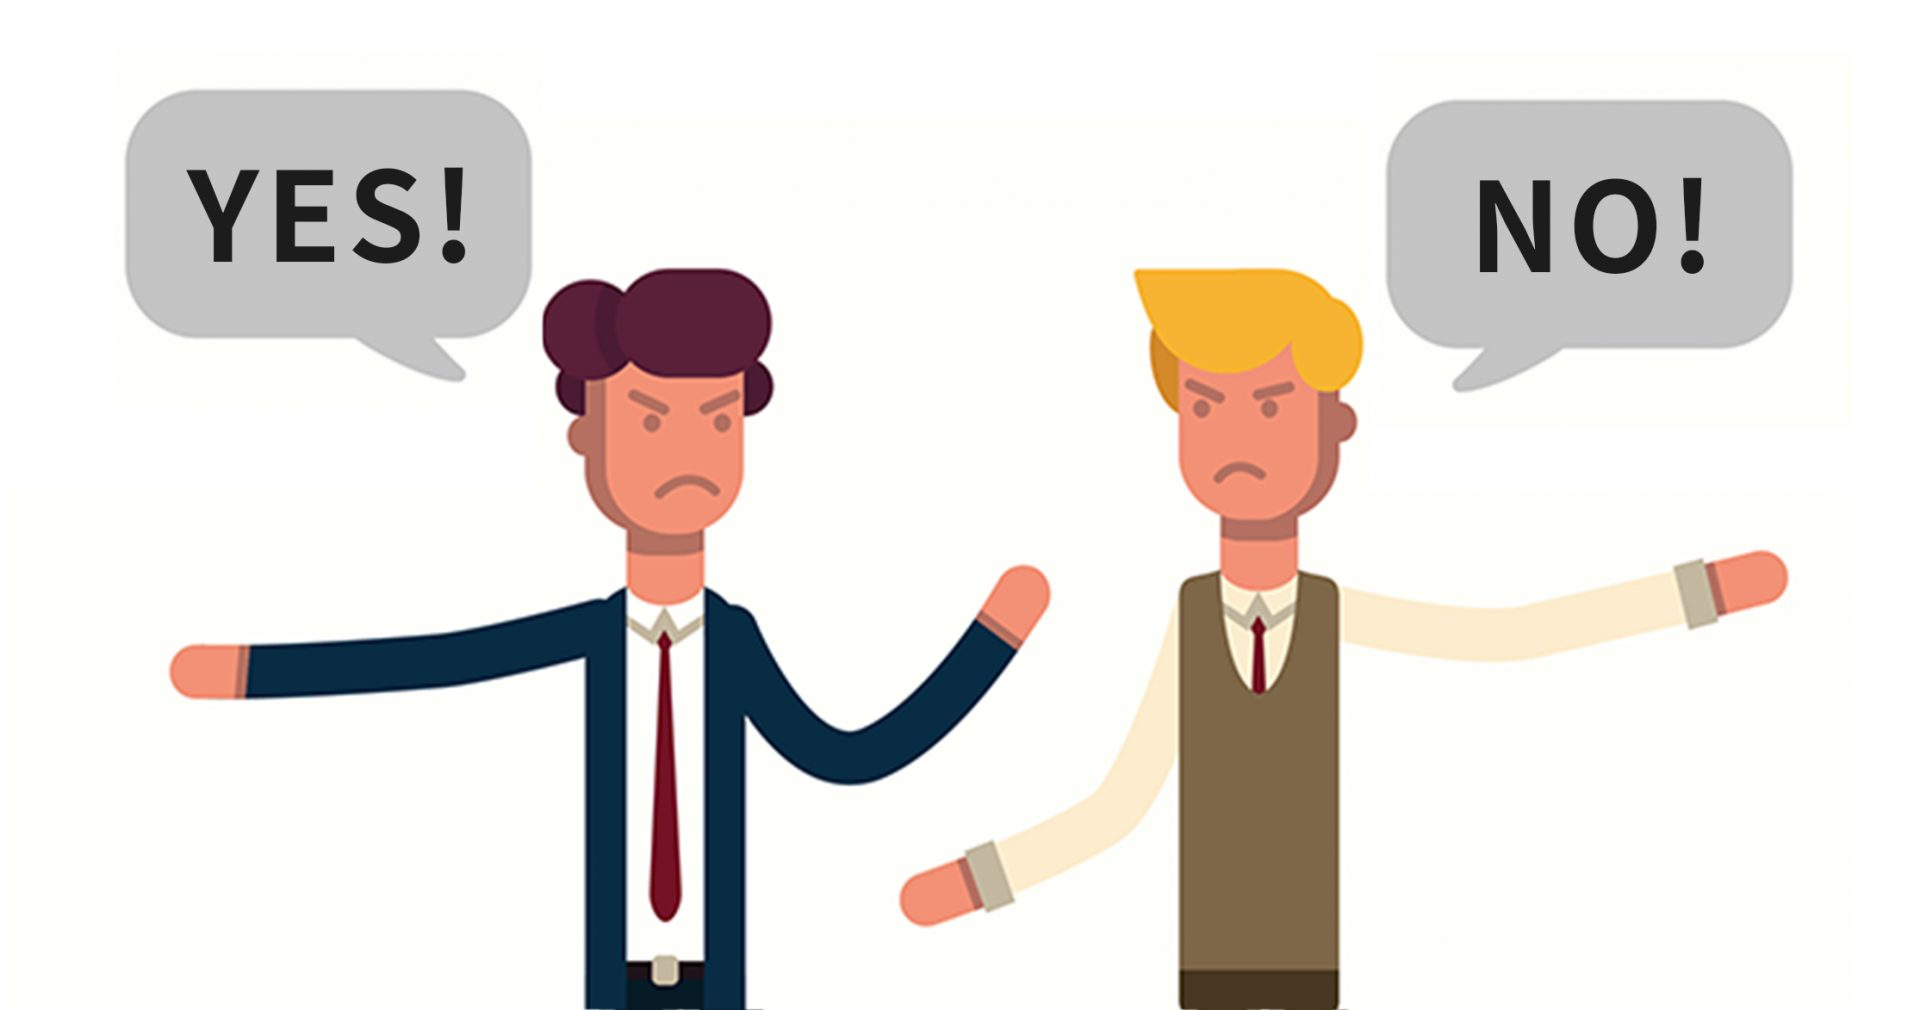 UXデザインプロジェクトでは合意形成と意思決定において必ずコンフリクト(意見の対立、論争)が起きるもの